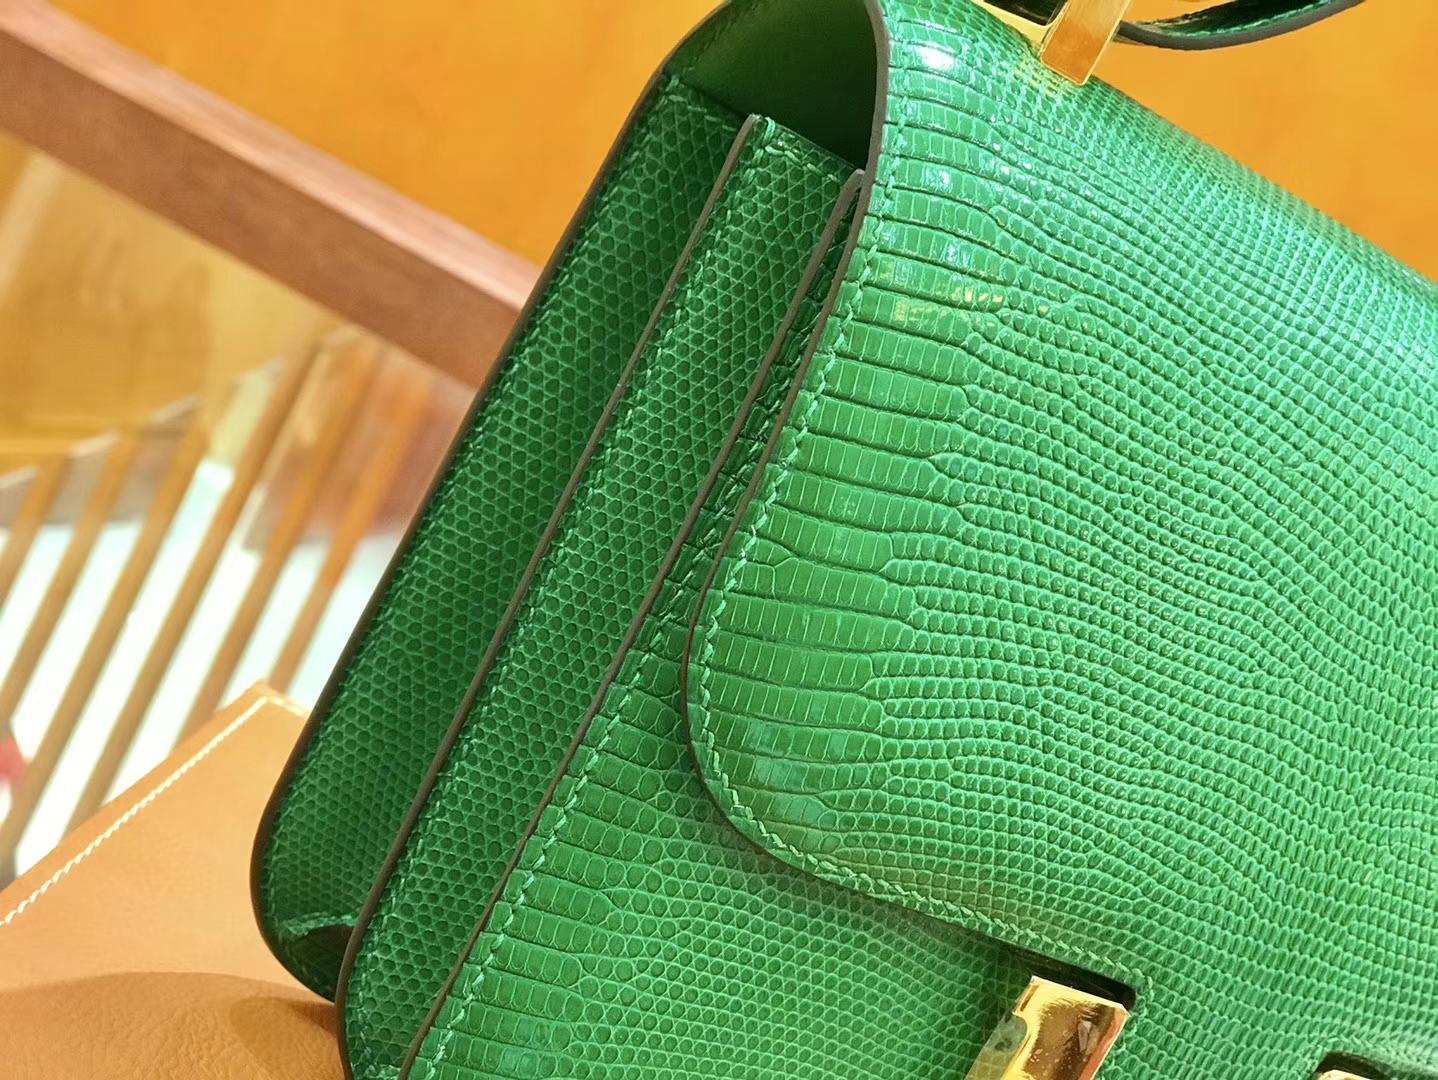 Hermès(爱马仕)Constance 空姐包 蜥蜴皮 仙人掌绿 24cm